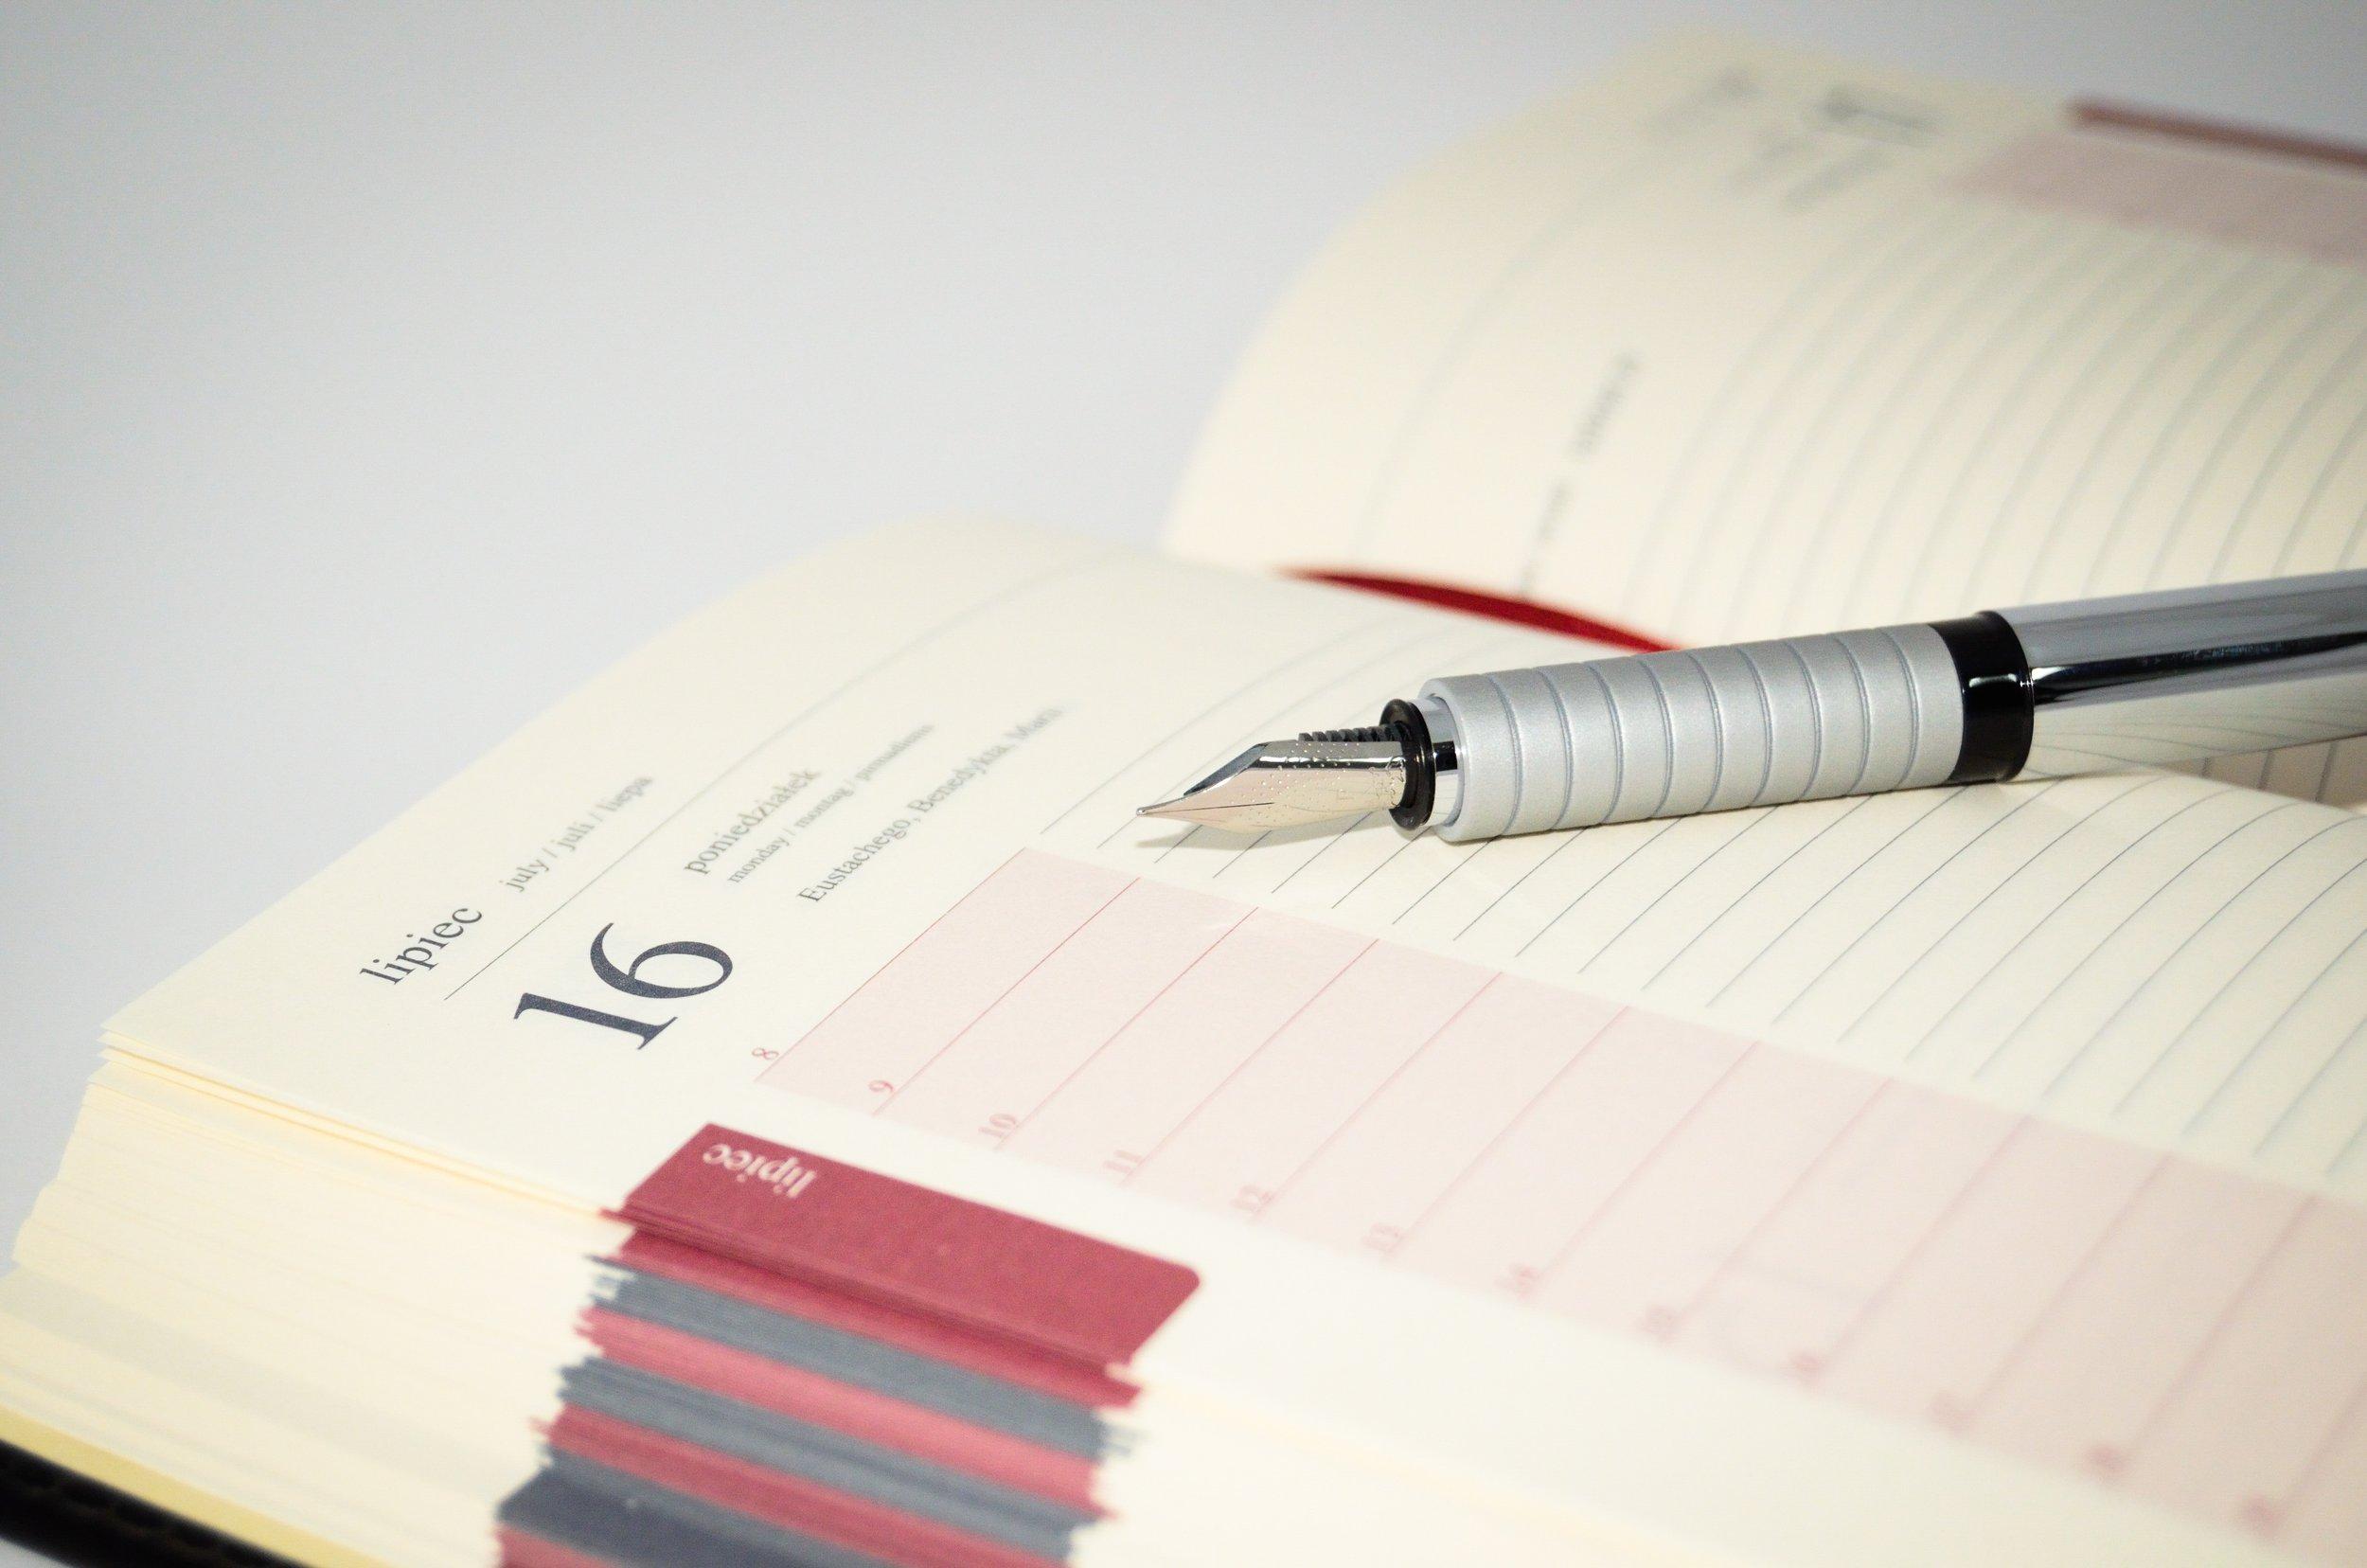 agenda-book-business-273025.jpg